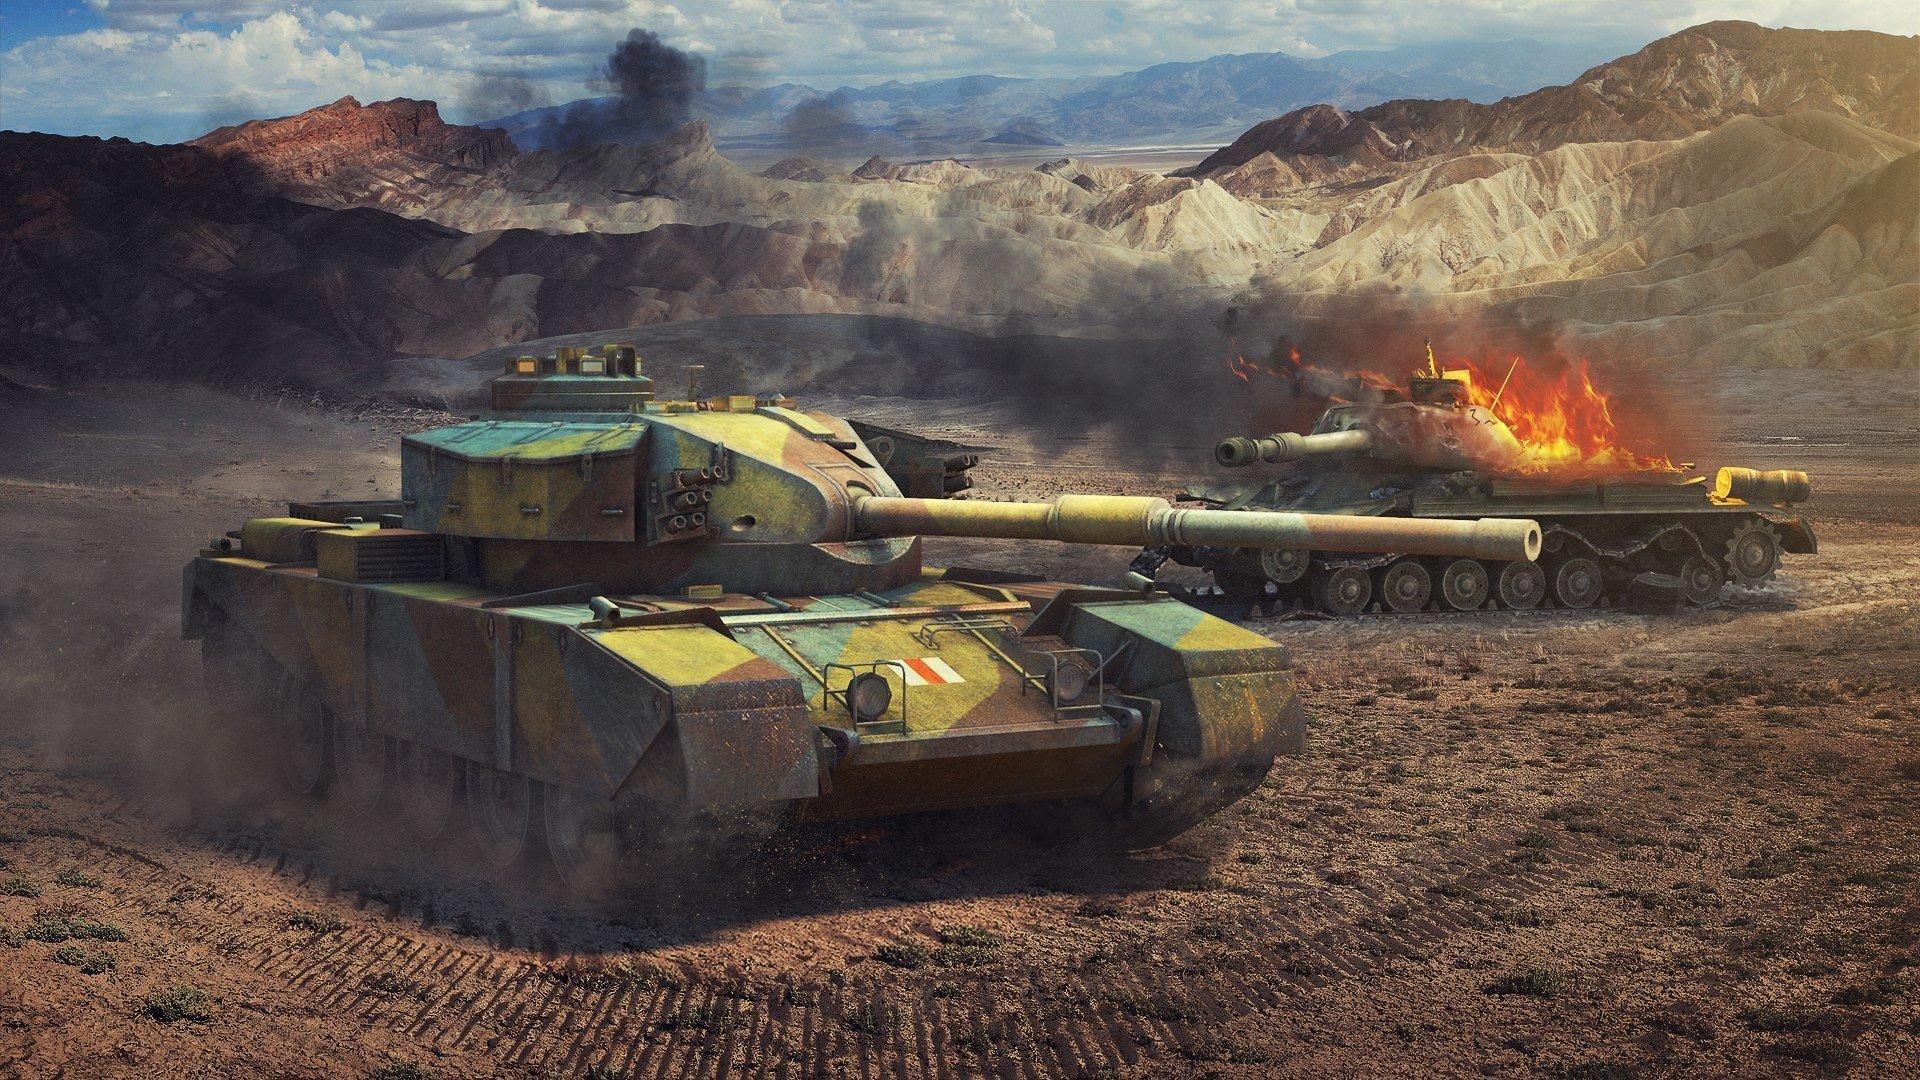 World of Tanks Wallpaper 1920X1080 - WallpaperSafari